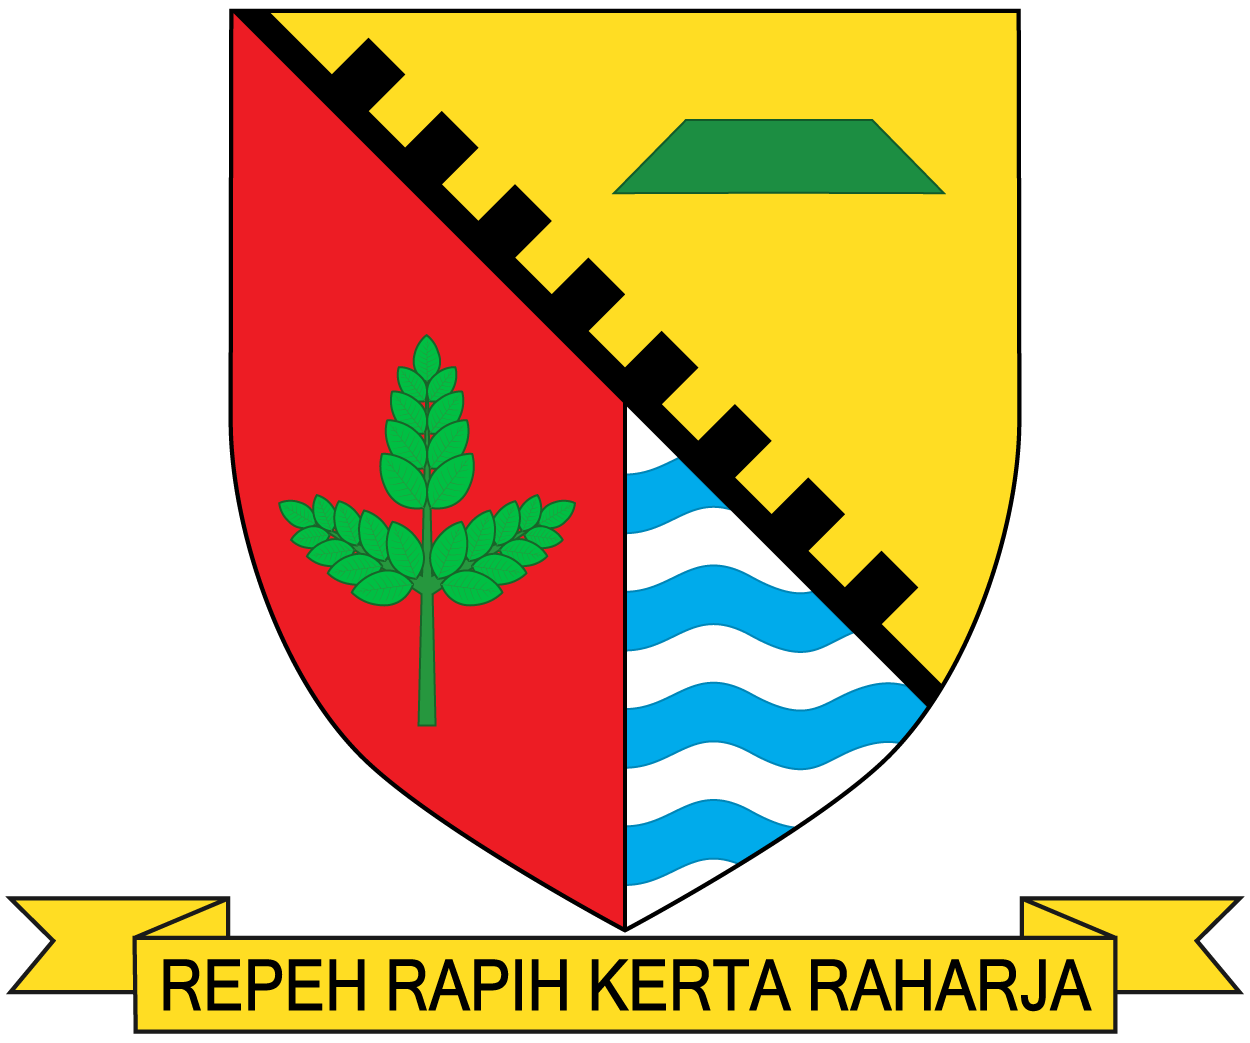 The Jarrdin Cihampelas Kota Bandung Jawa Barat: Berkas:Lambang Kabupaten Bandung.png